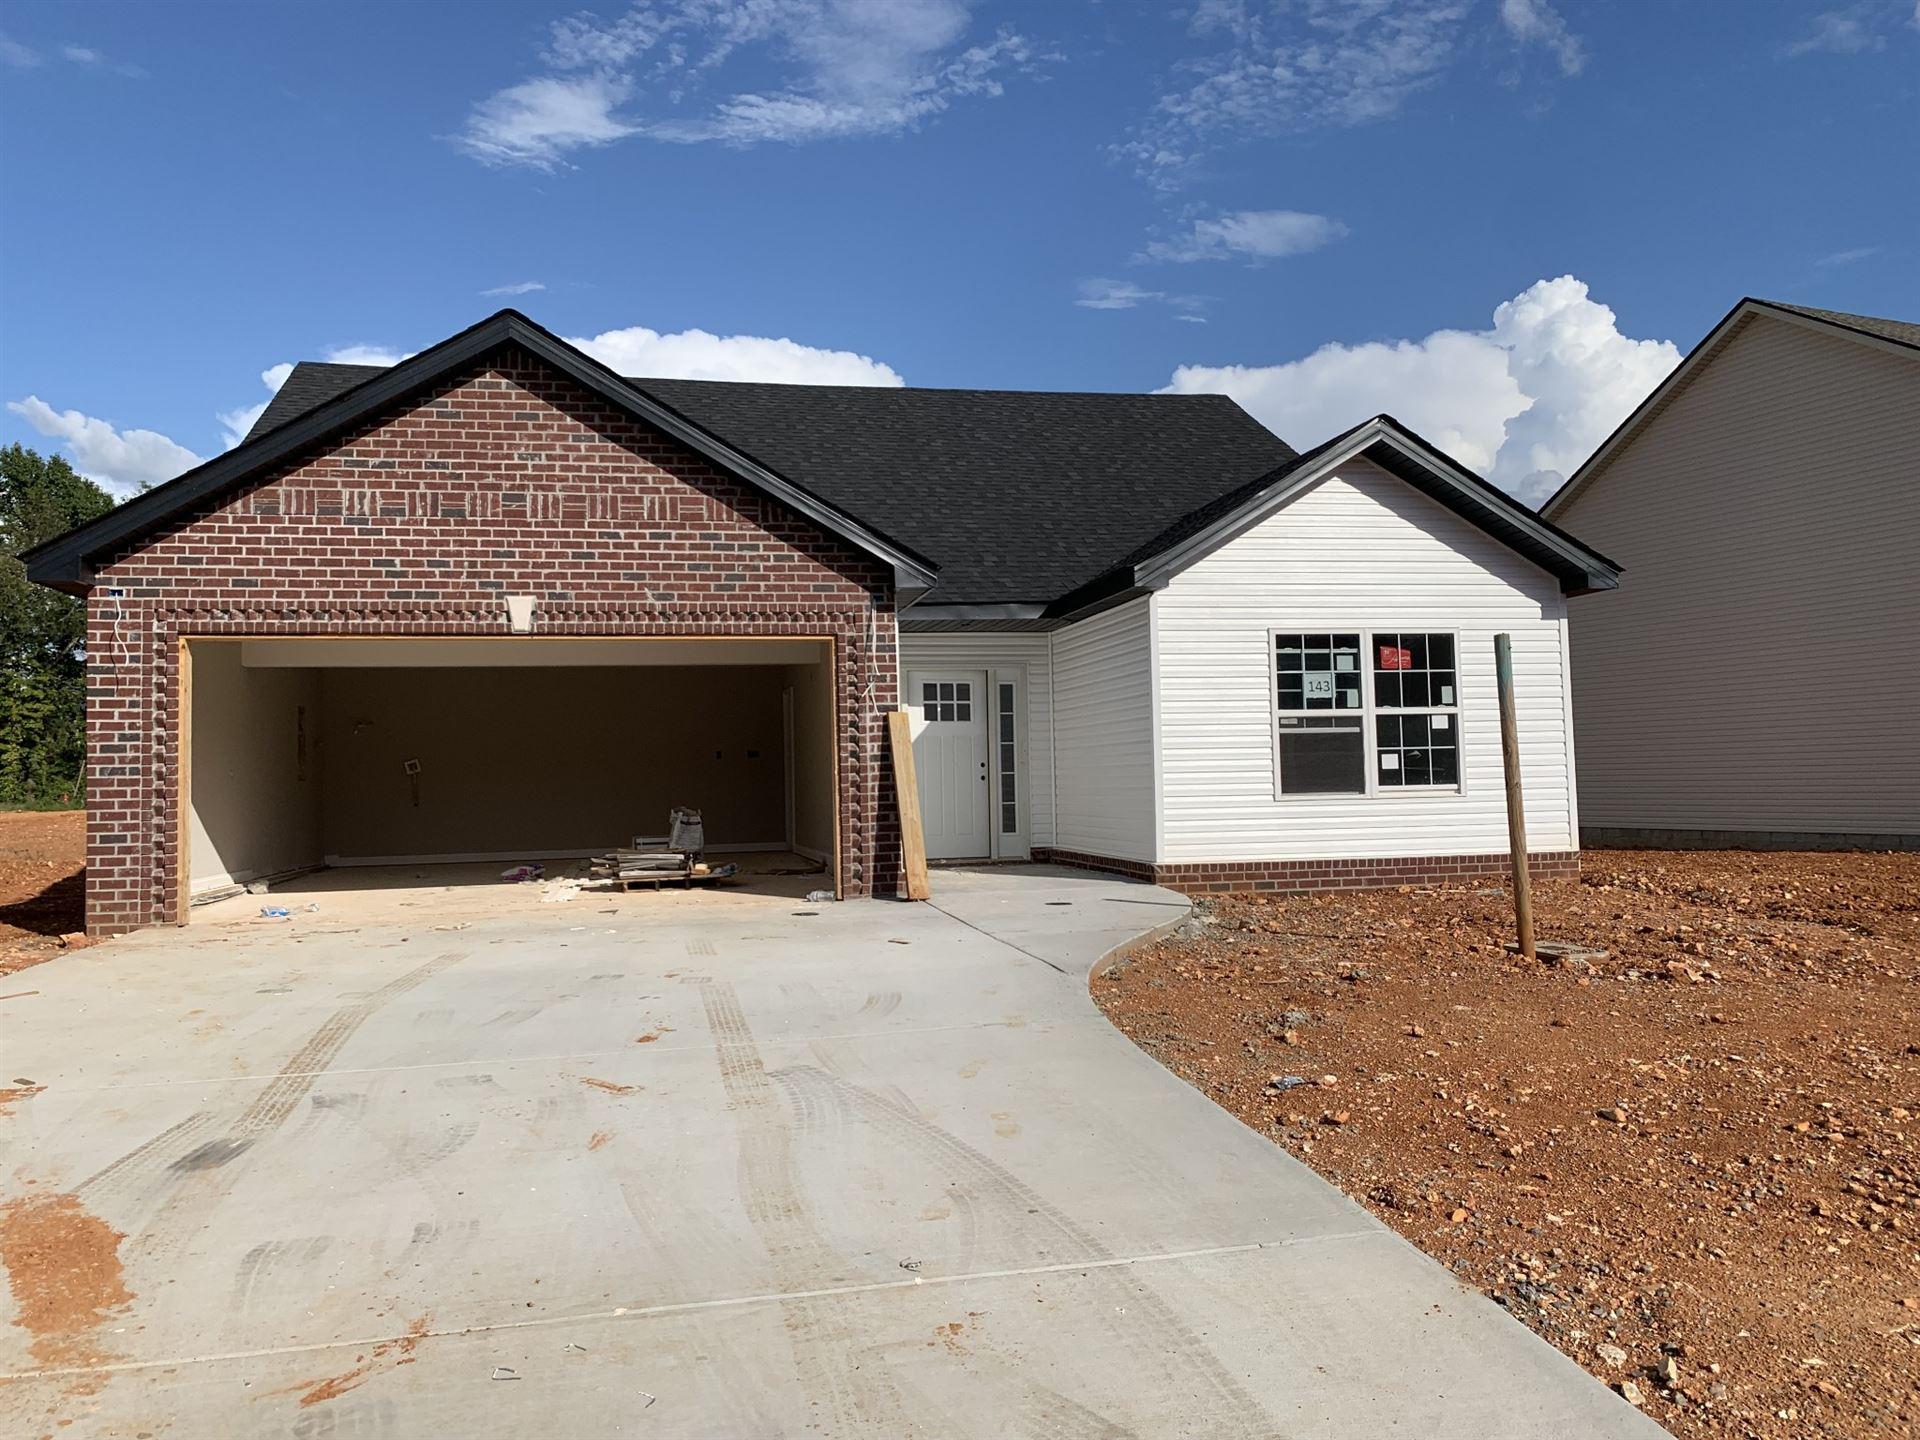 143 Irish Hills, Clarksville, TN 37042 - MLS#: 2265293